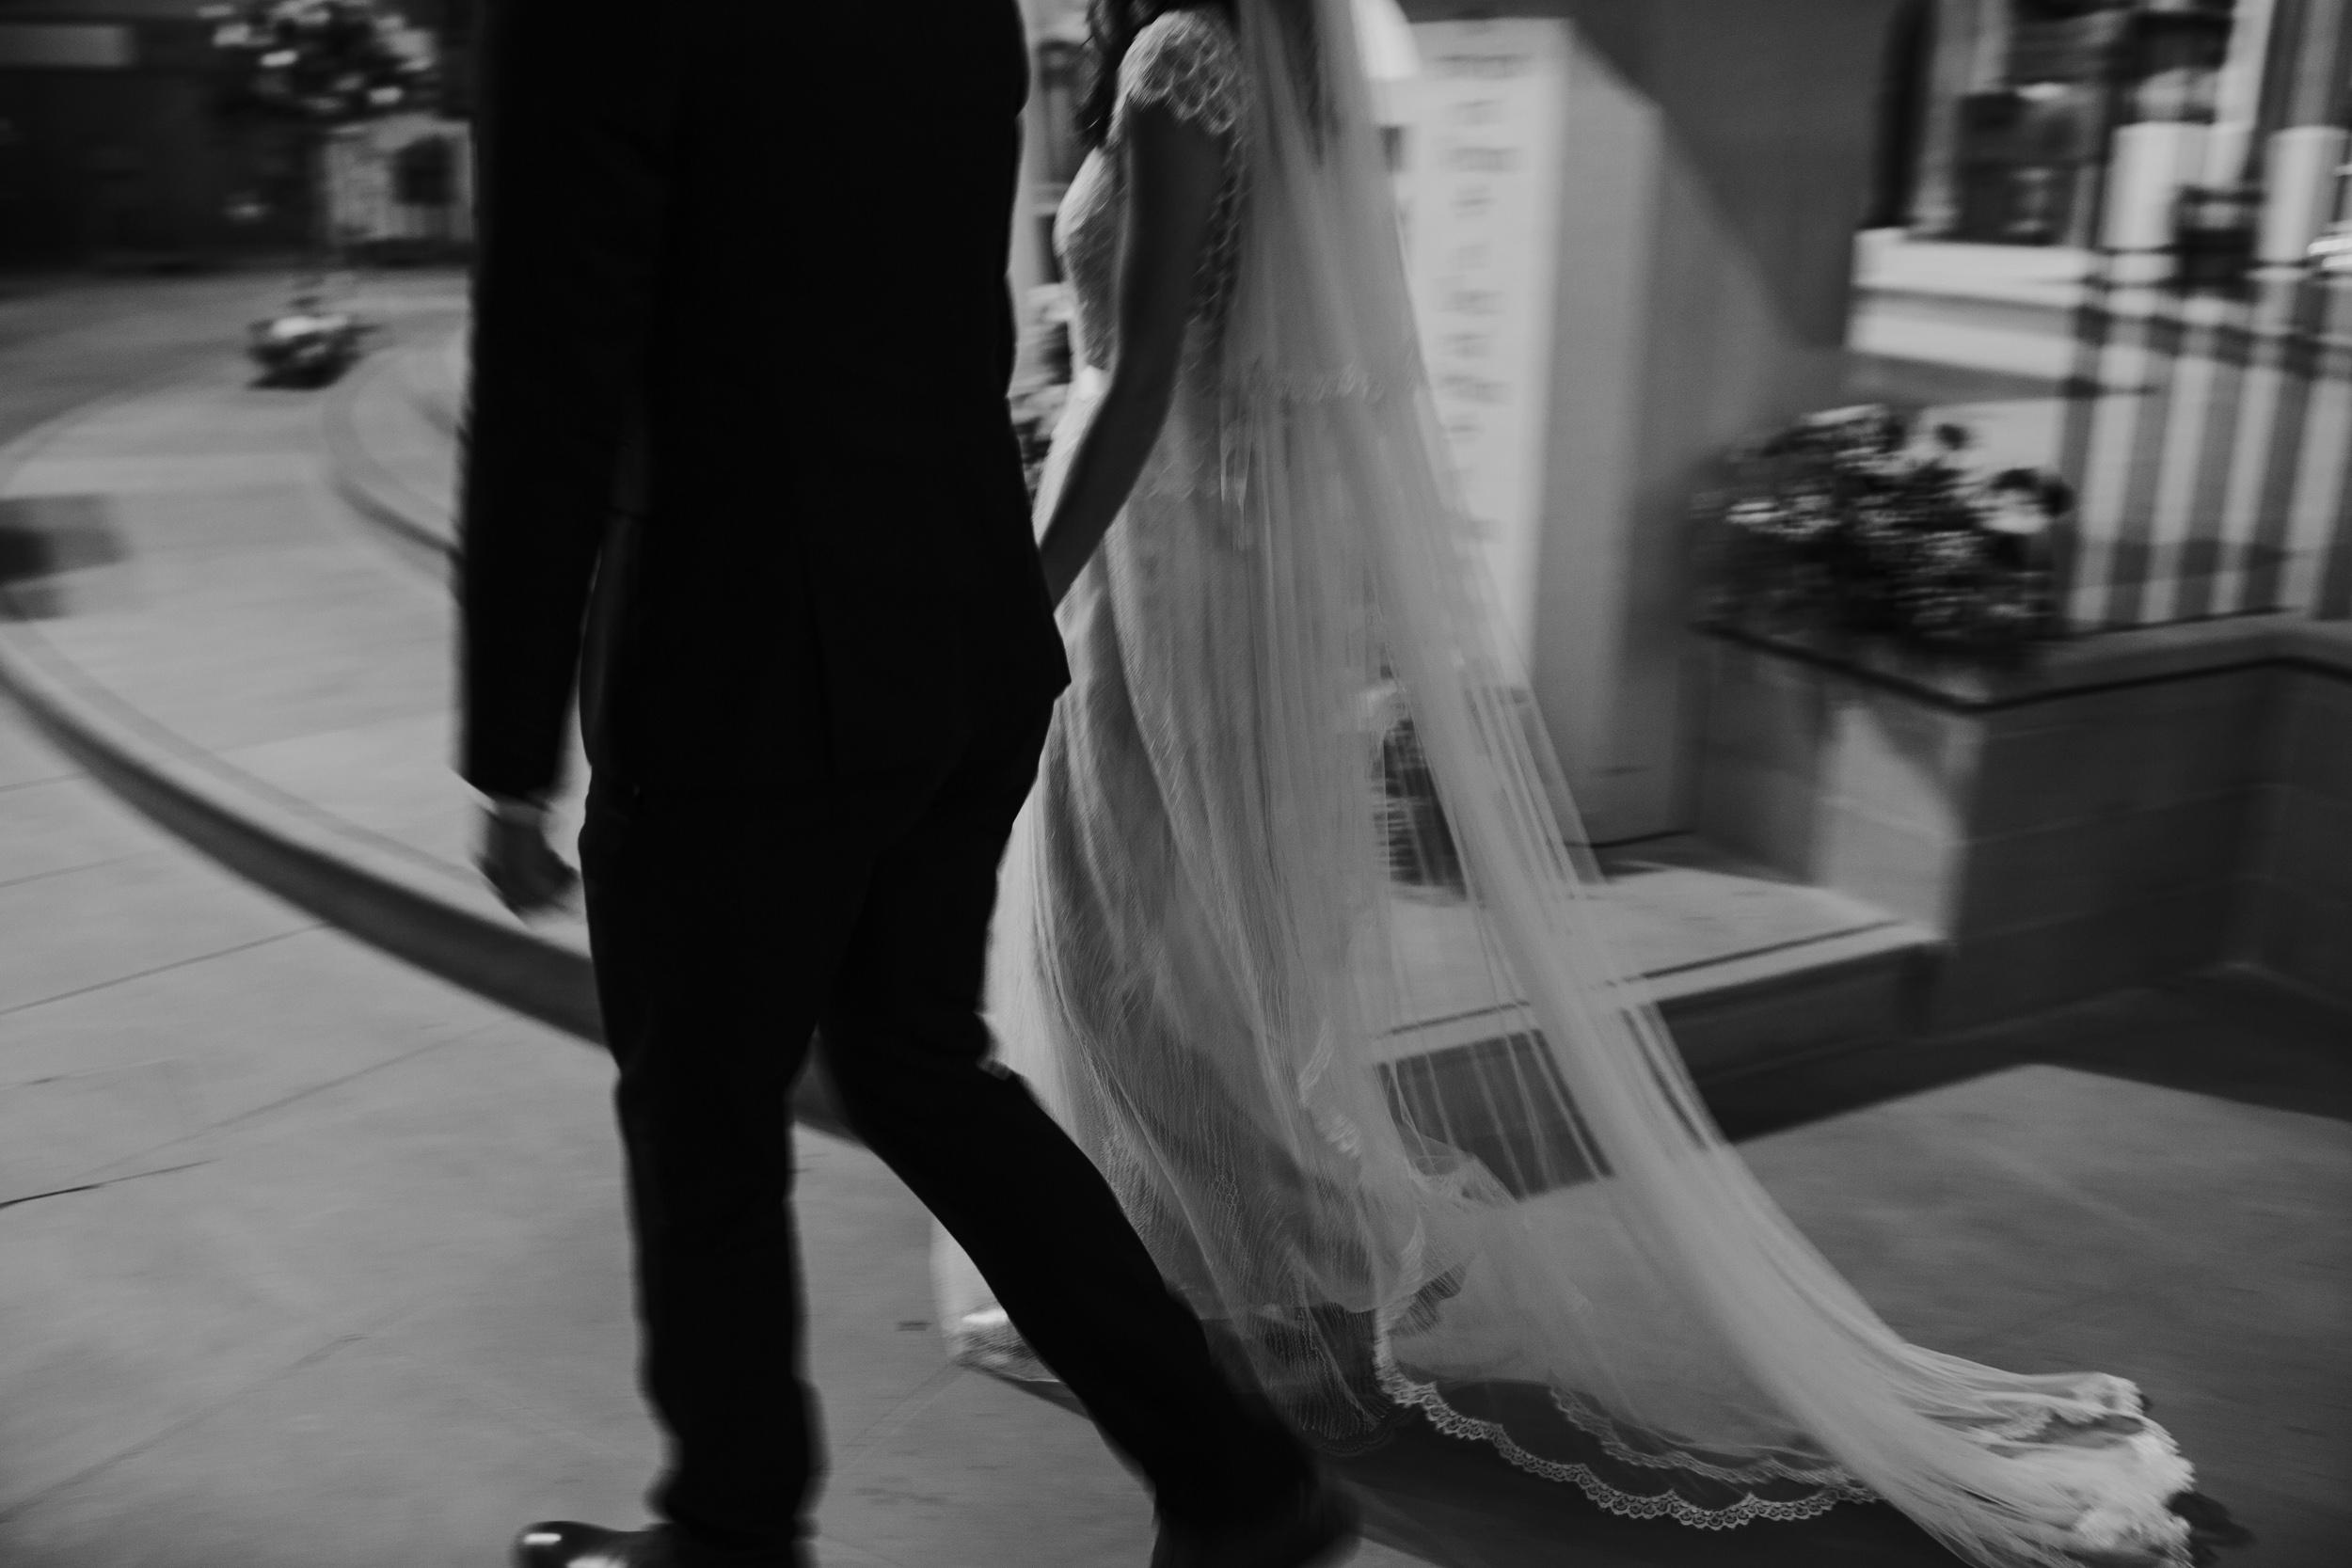 Joasia-Kate-Beaumont-Bohemian-Lace-Wedding-Dress-Peak-District-Sheffield-Wedding-16.jpg